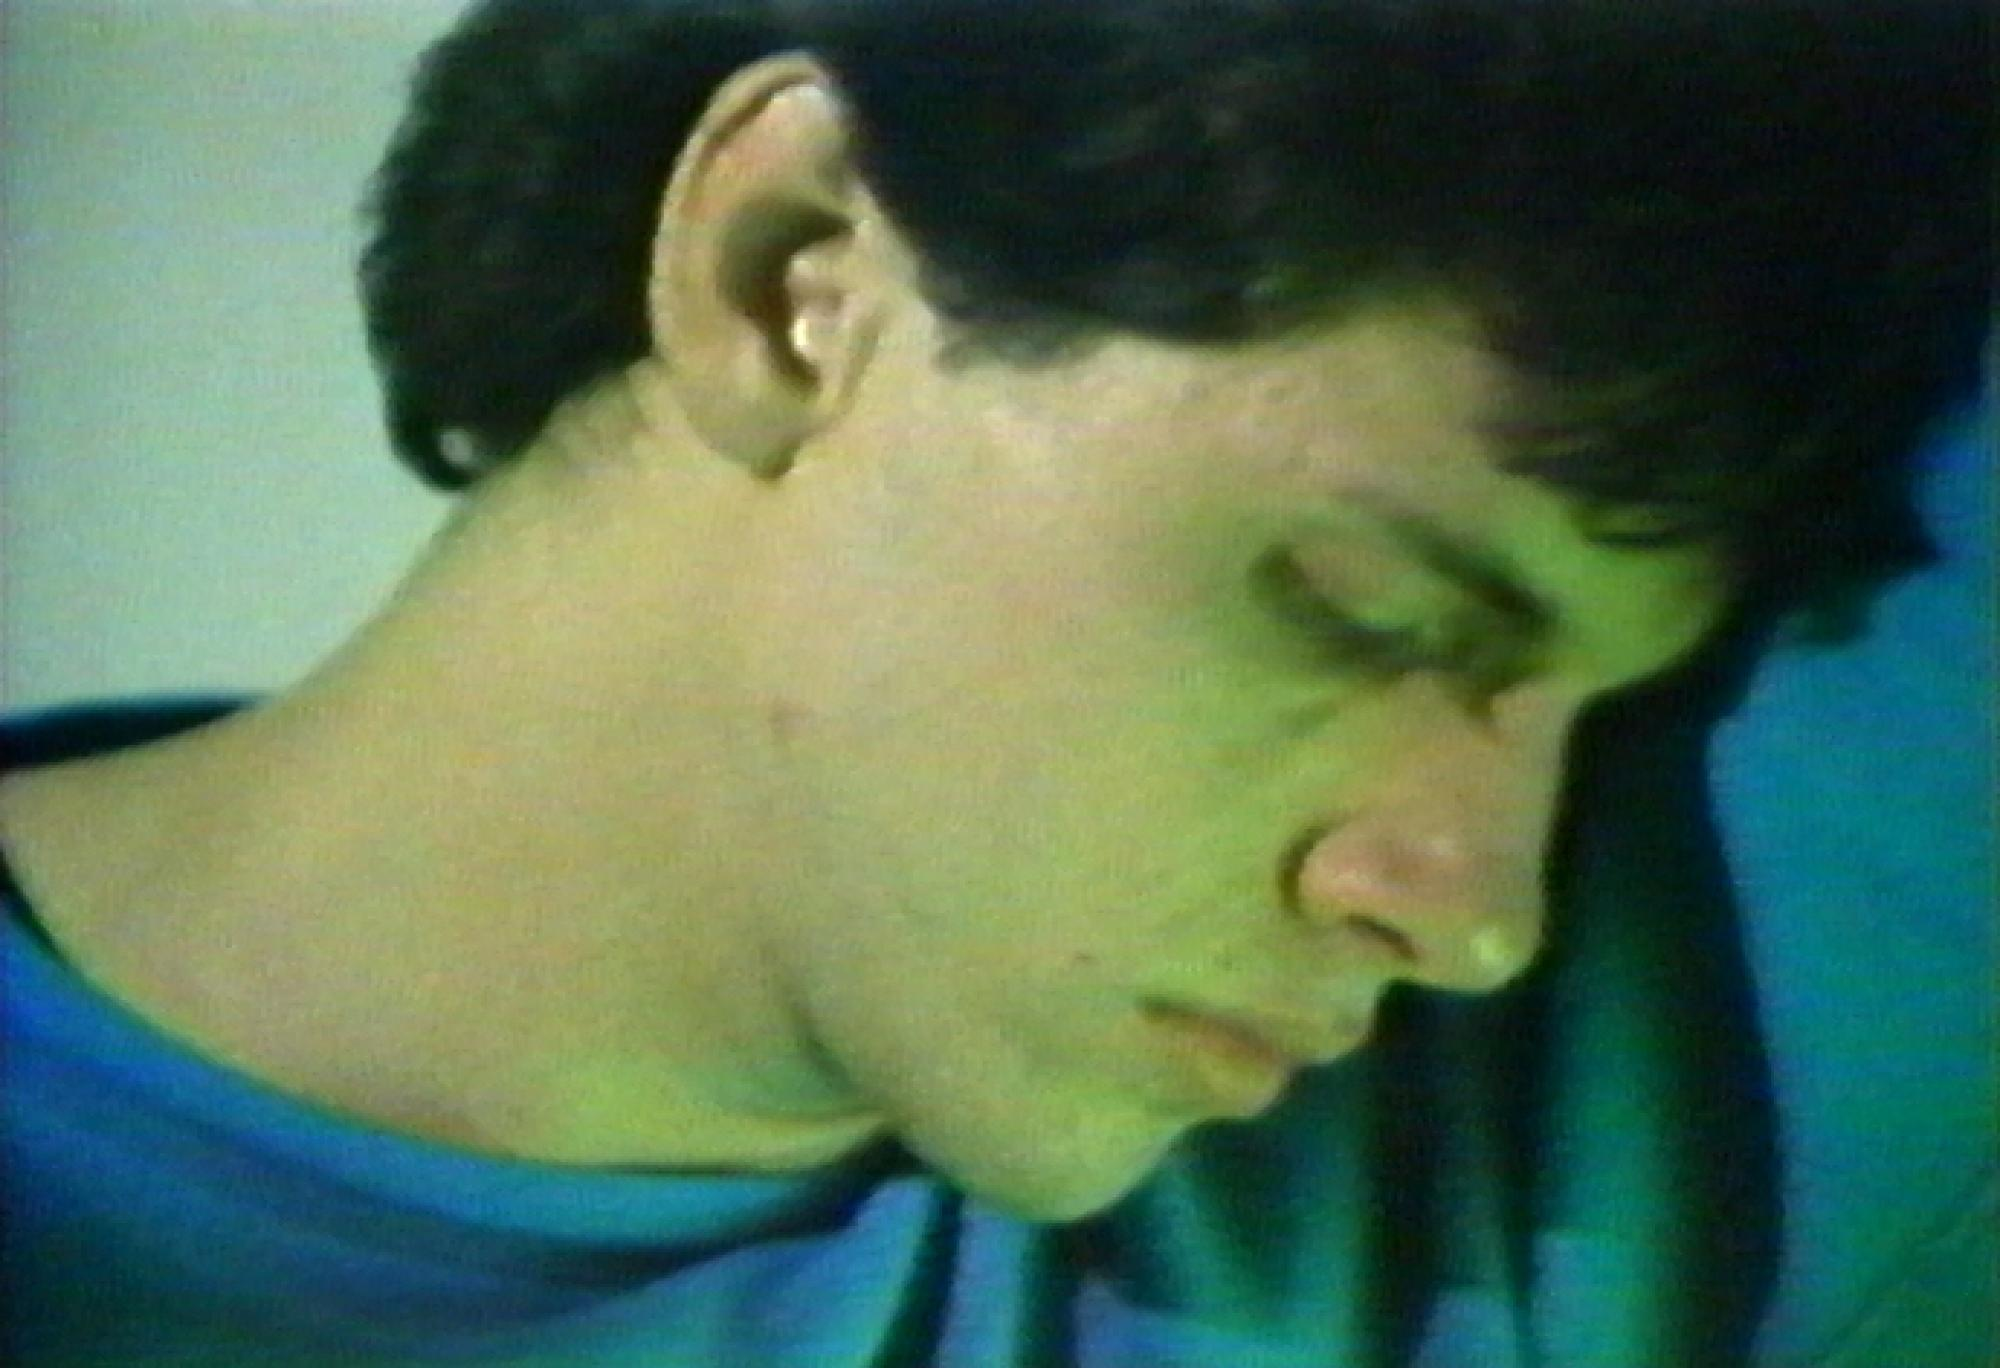 [ Fig. 04 ] <i>Le voyage de l'ogre / The Path of the Ogre</i> (video still), 1981.